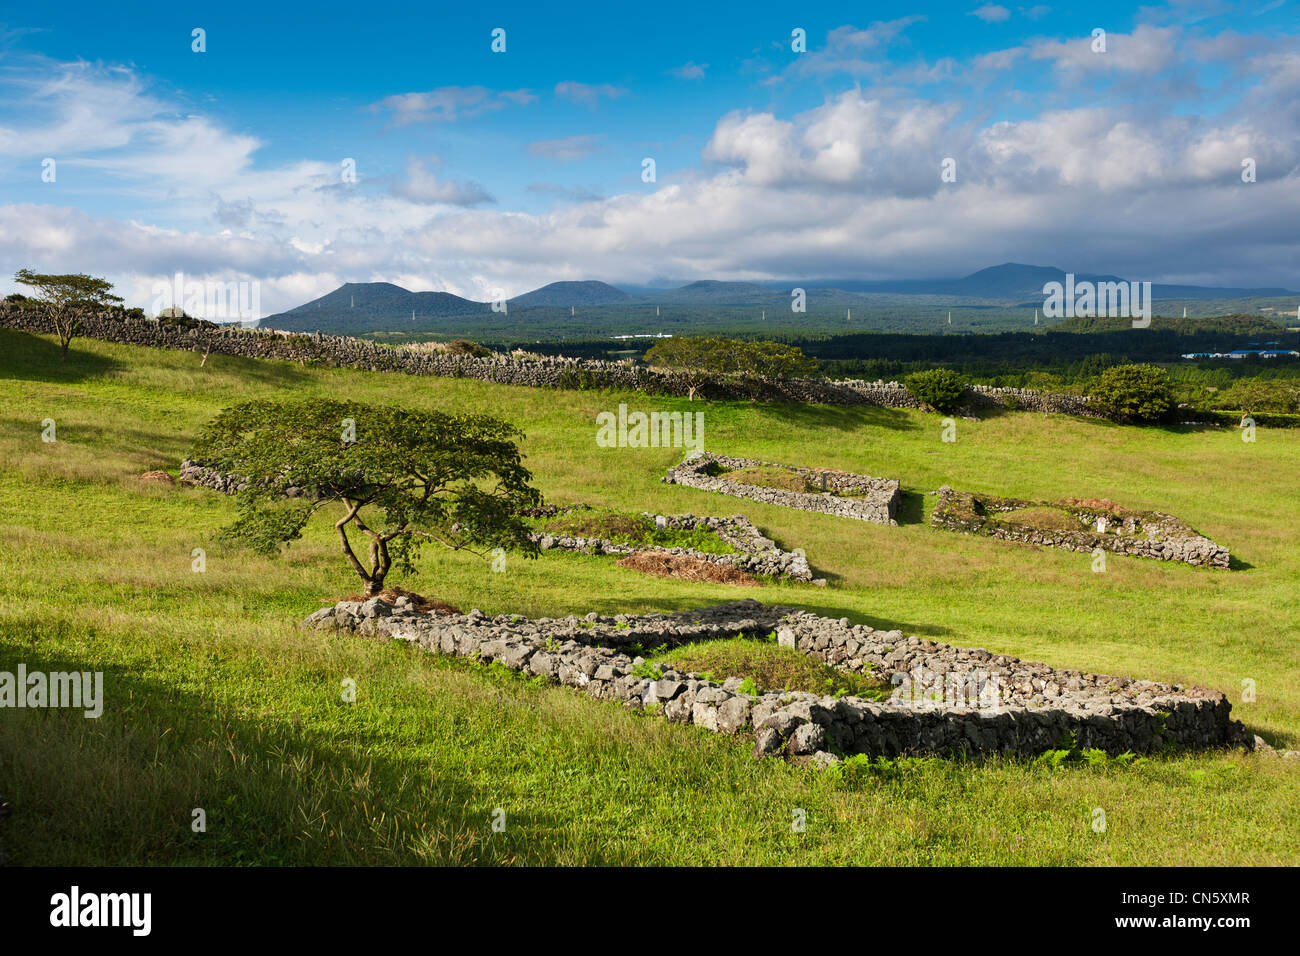 South Korea, Jeju Province, Seongeup, burial site in the bucolic landscape of Sangumbuli Stock Photo